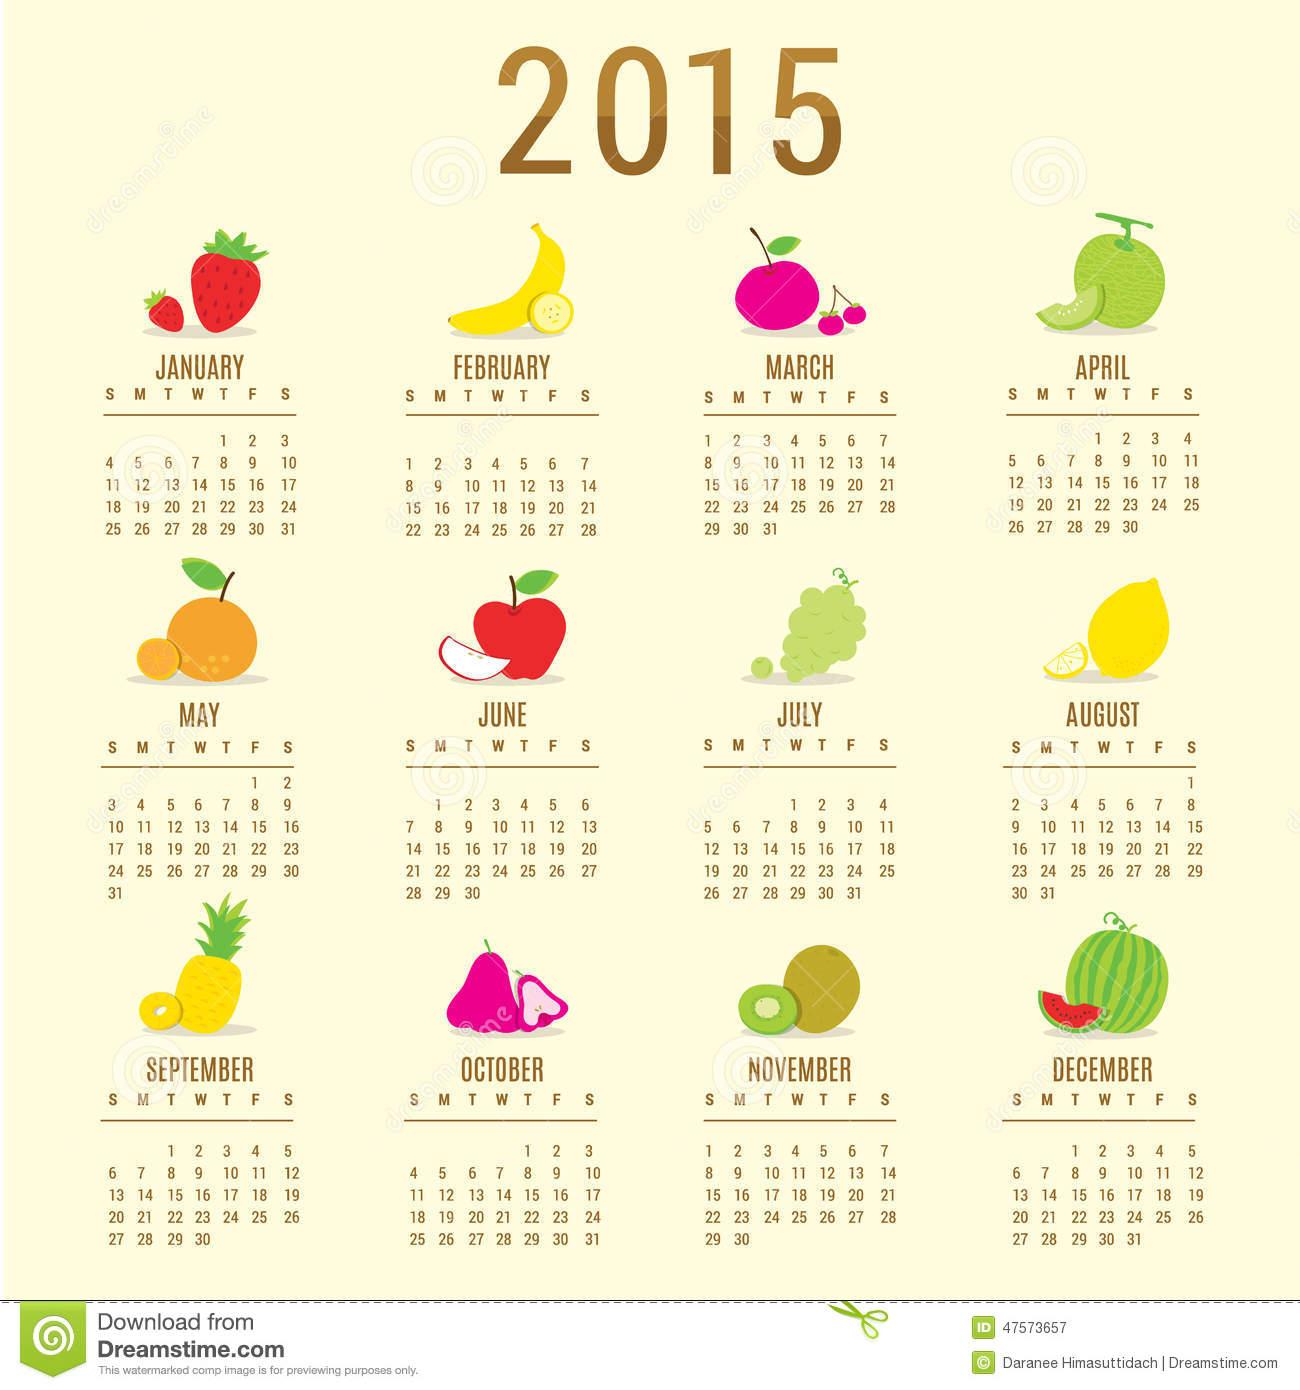 Calendar 2015 Fruit Cute Cartoon Vector Stock Vector   Image  47573657